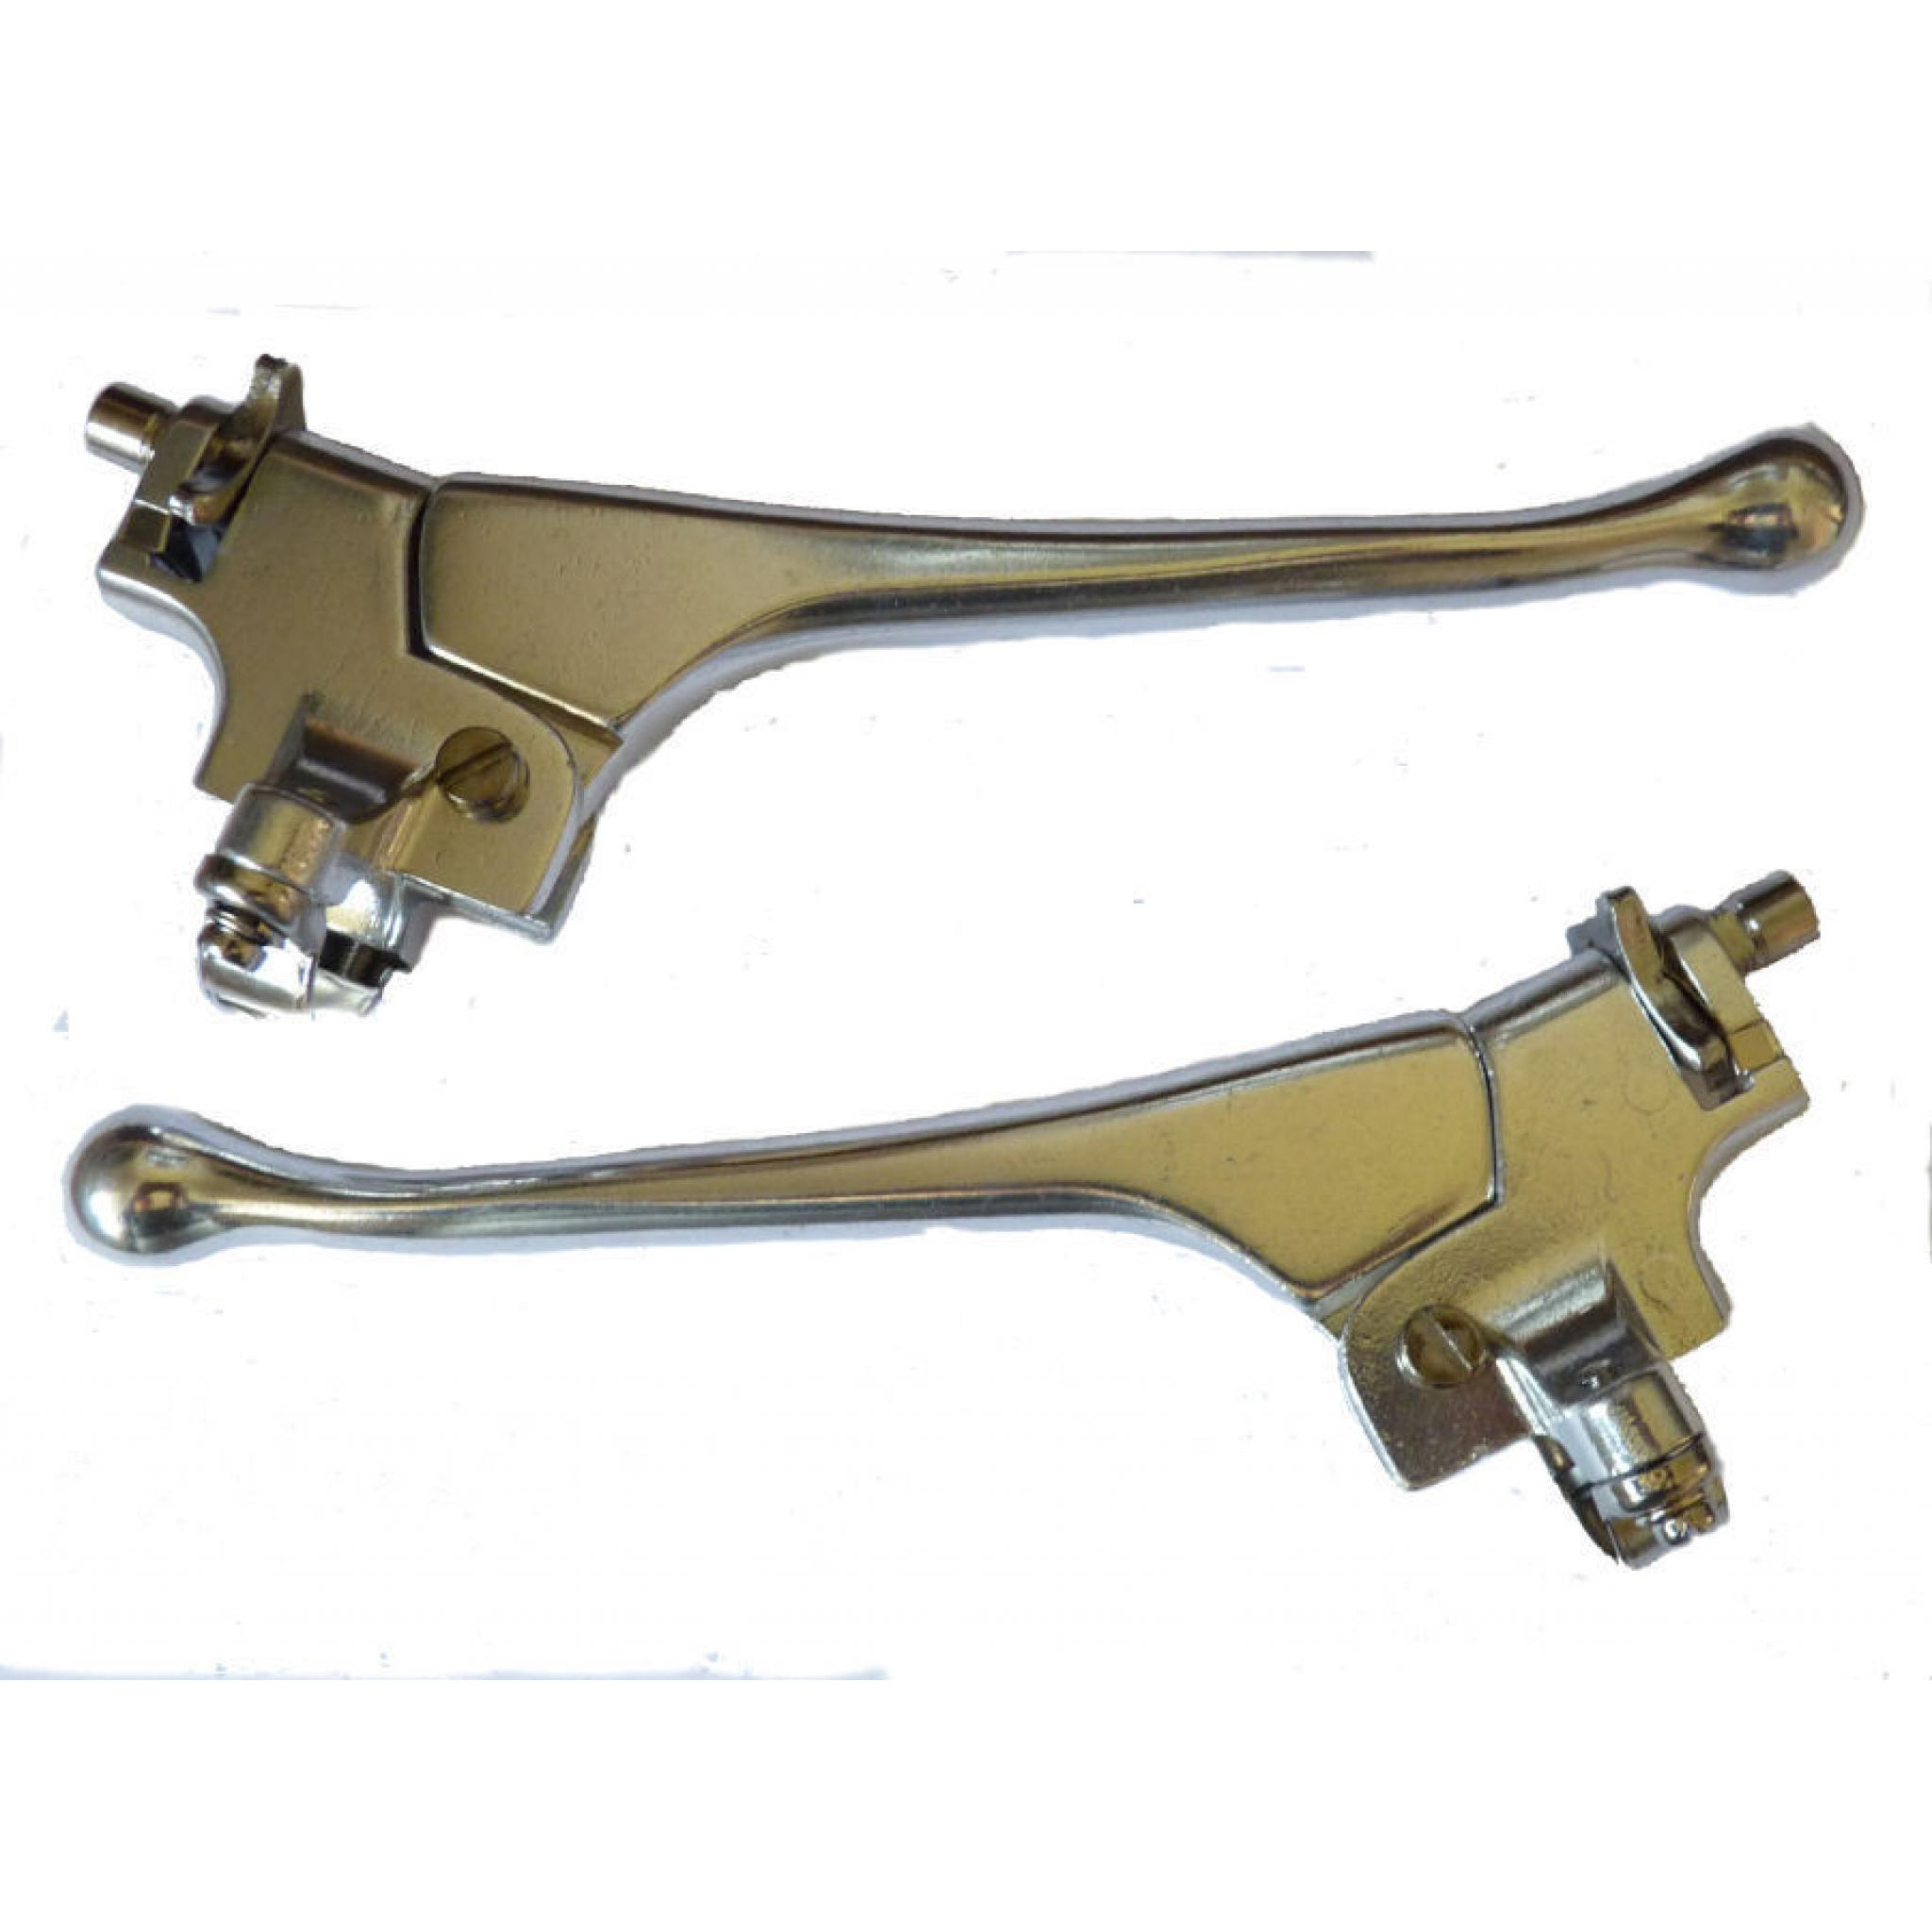 "Chromed steel For 7//8/"" diameter handlebars PAIR of bicycle BRAKE LEVERS"